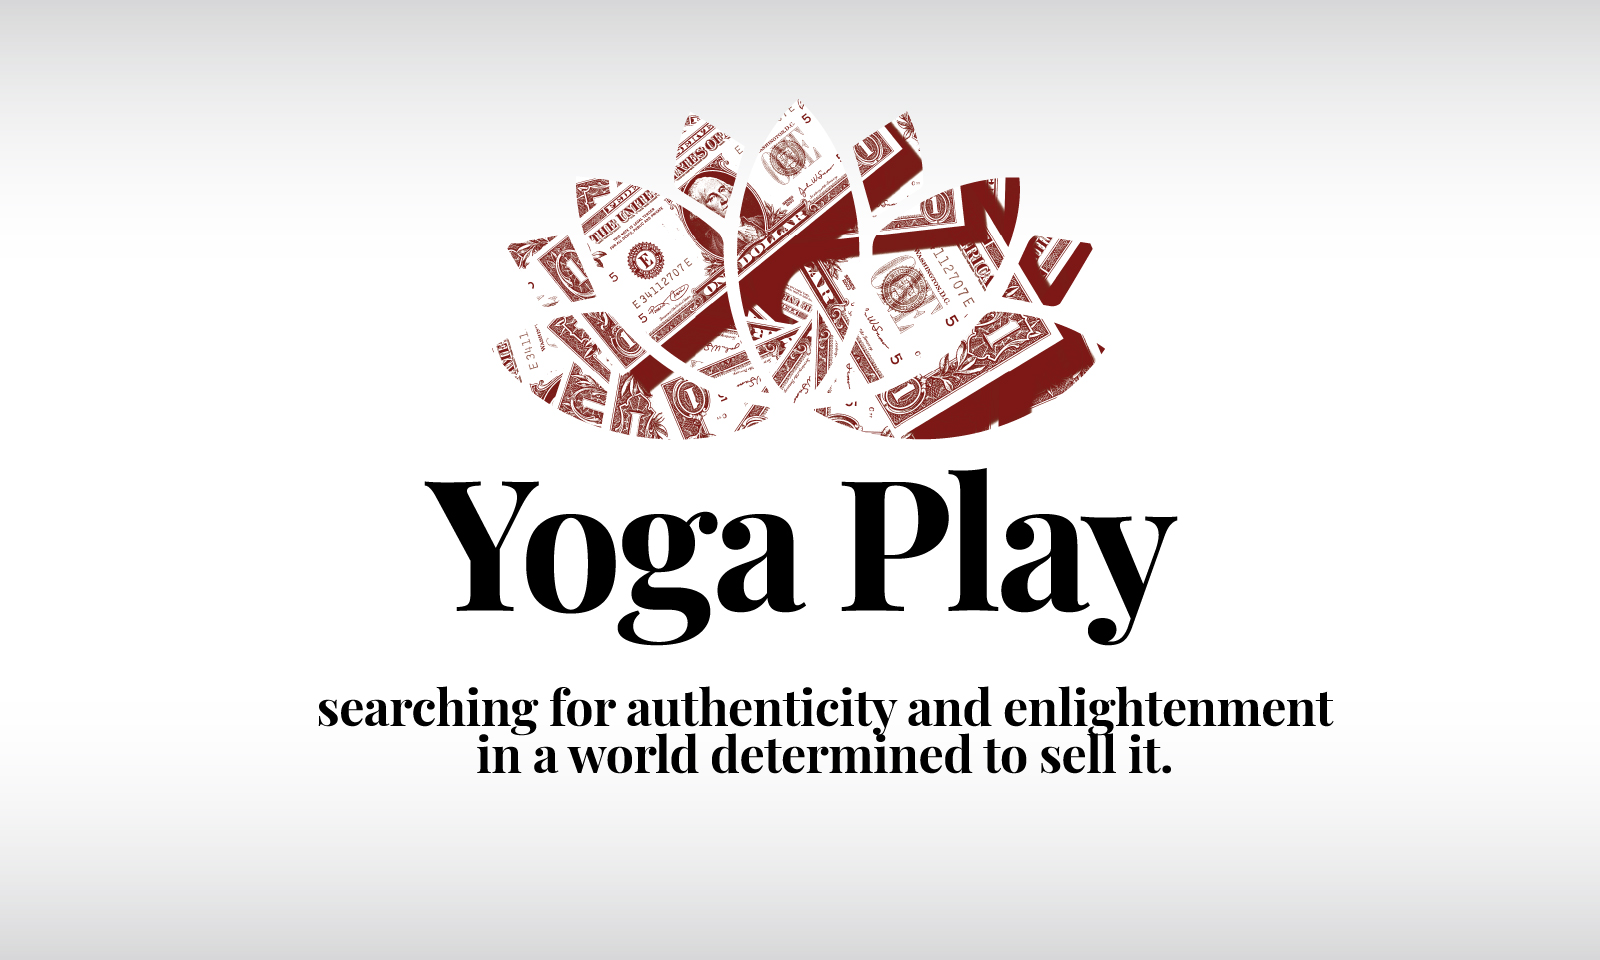 Yoga Play